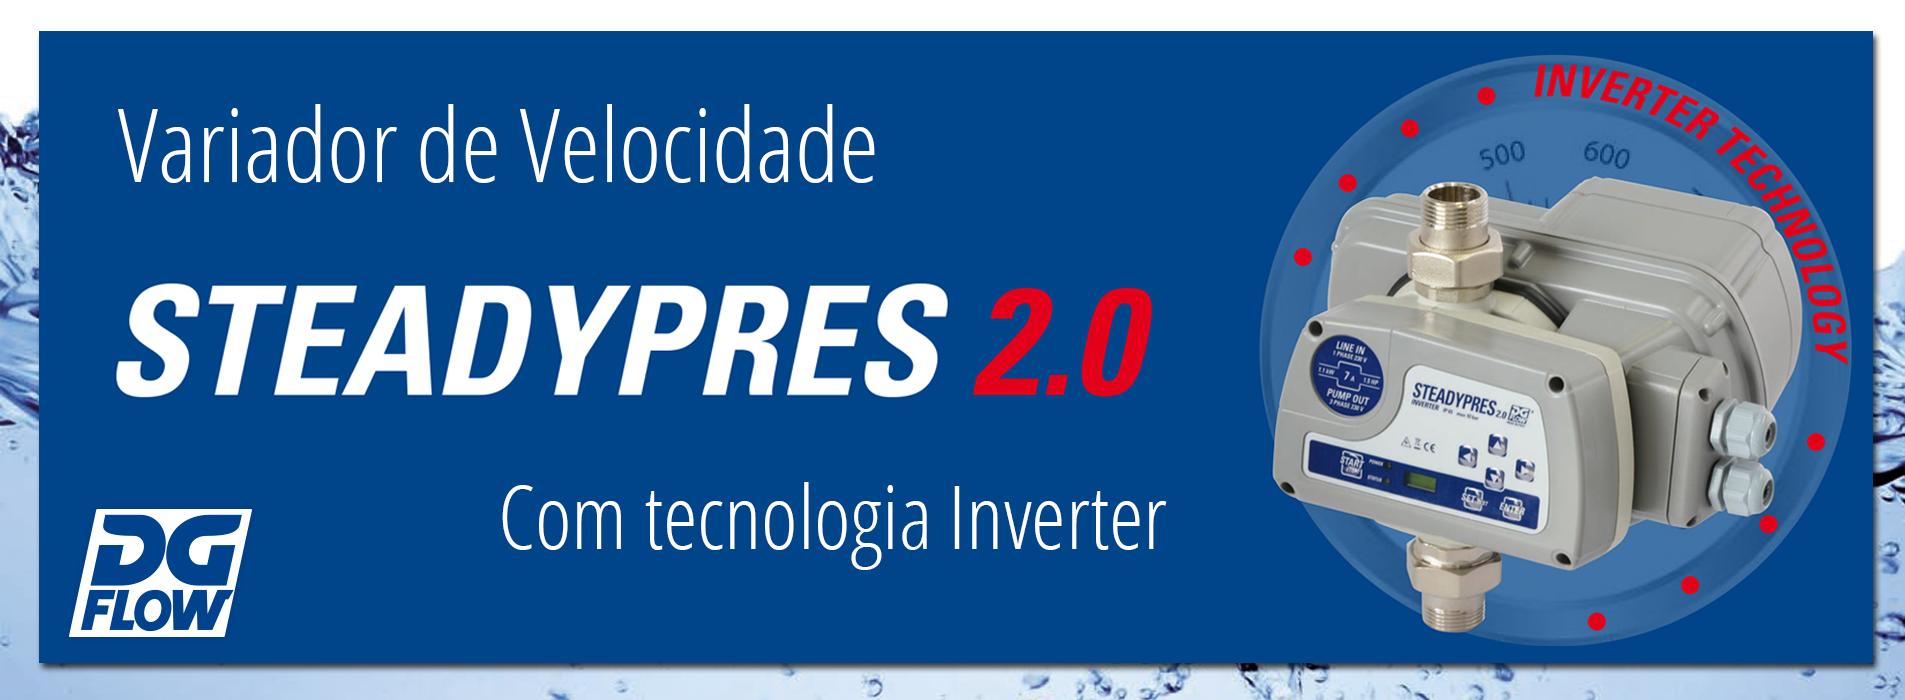 Banner Steadypres 2.0